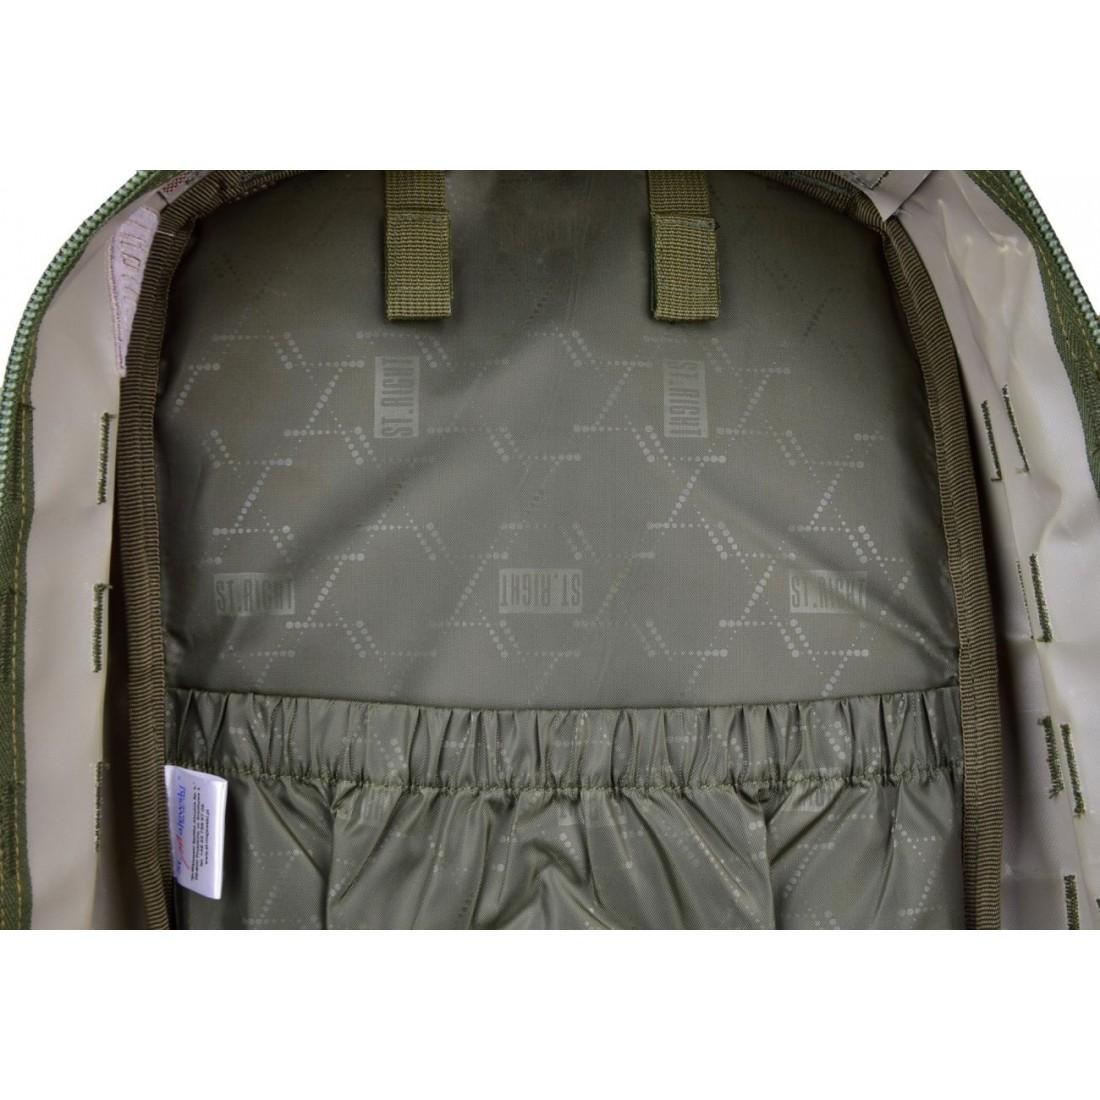 80d466764e40d RIGHT · Plecak camo 35 l. MILITARY wojskowy, plecak taktyczny, moro, ST.